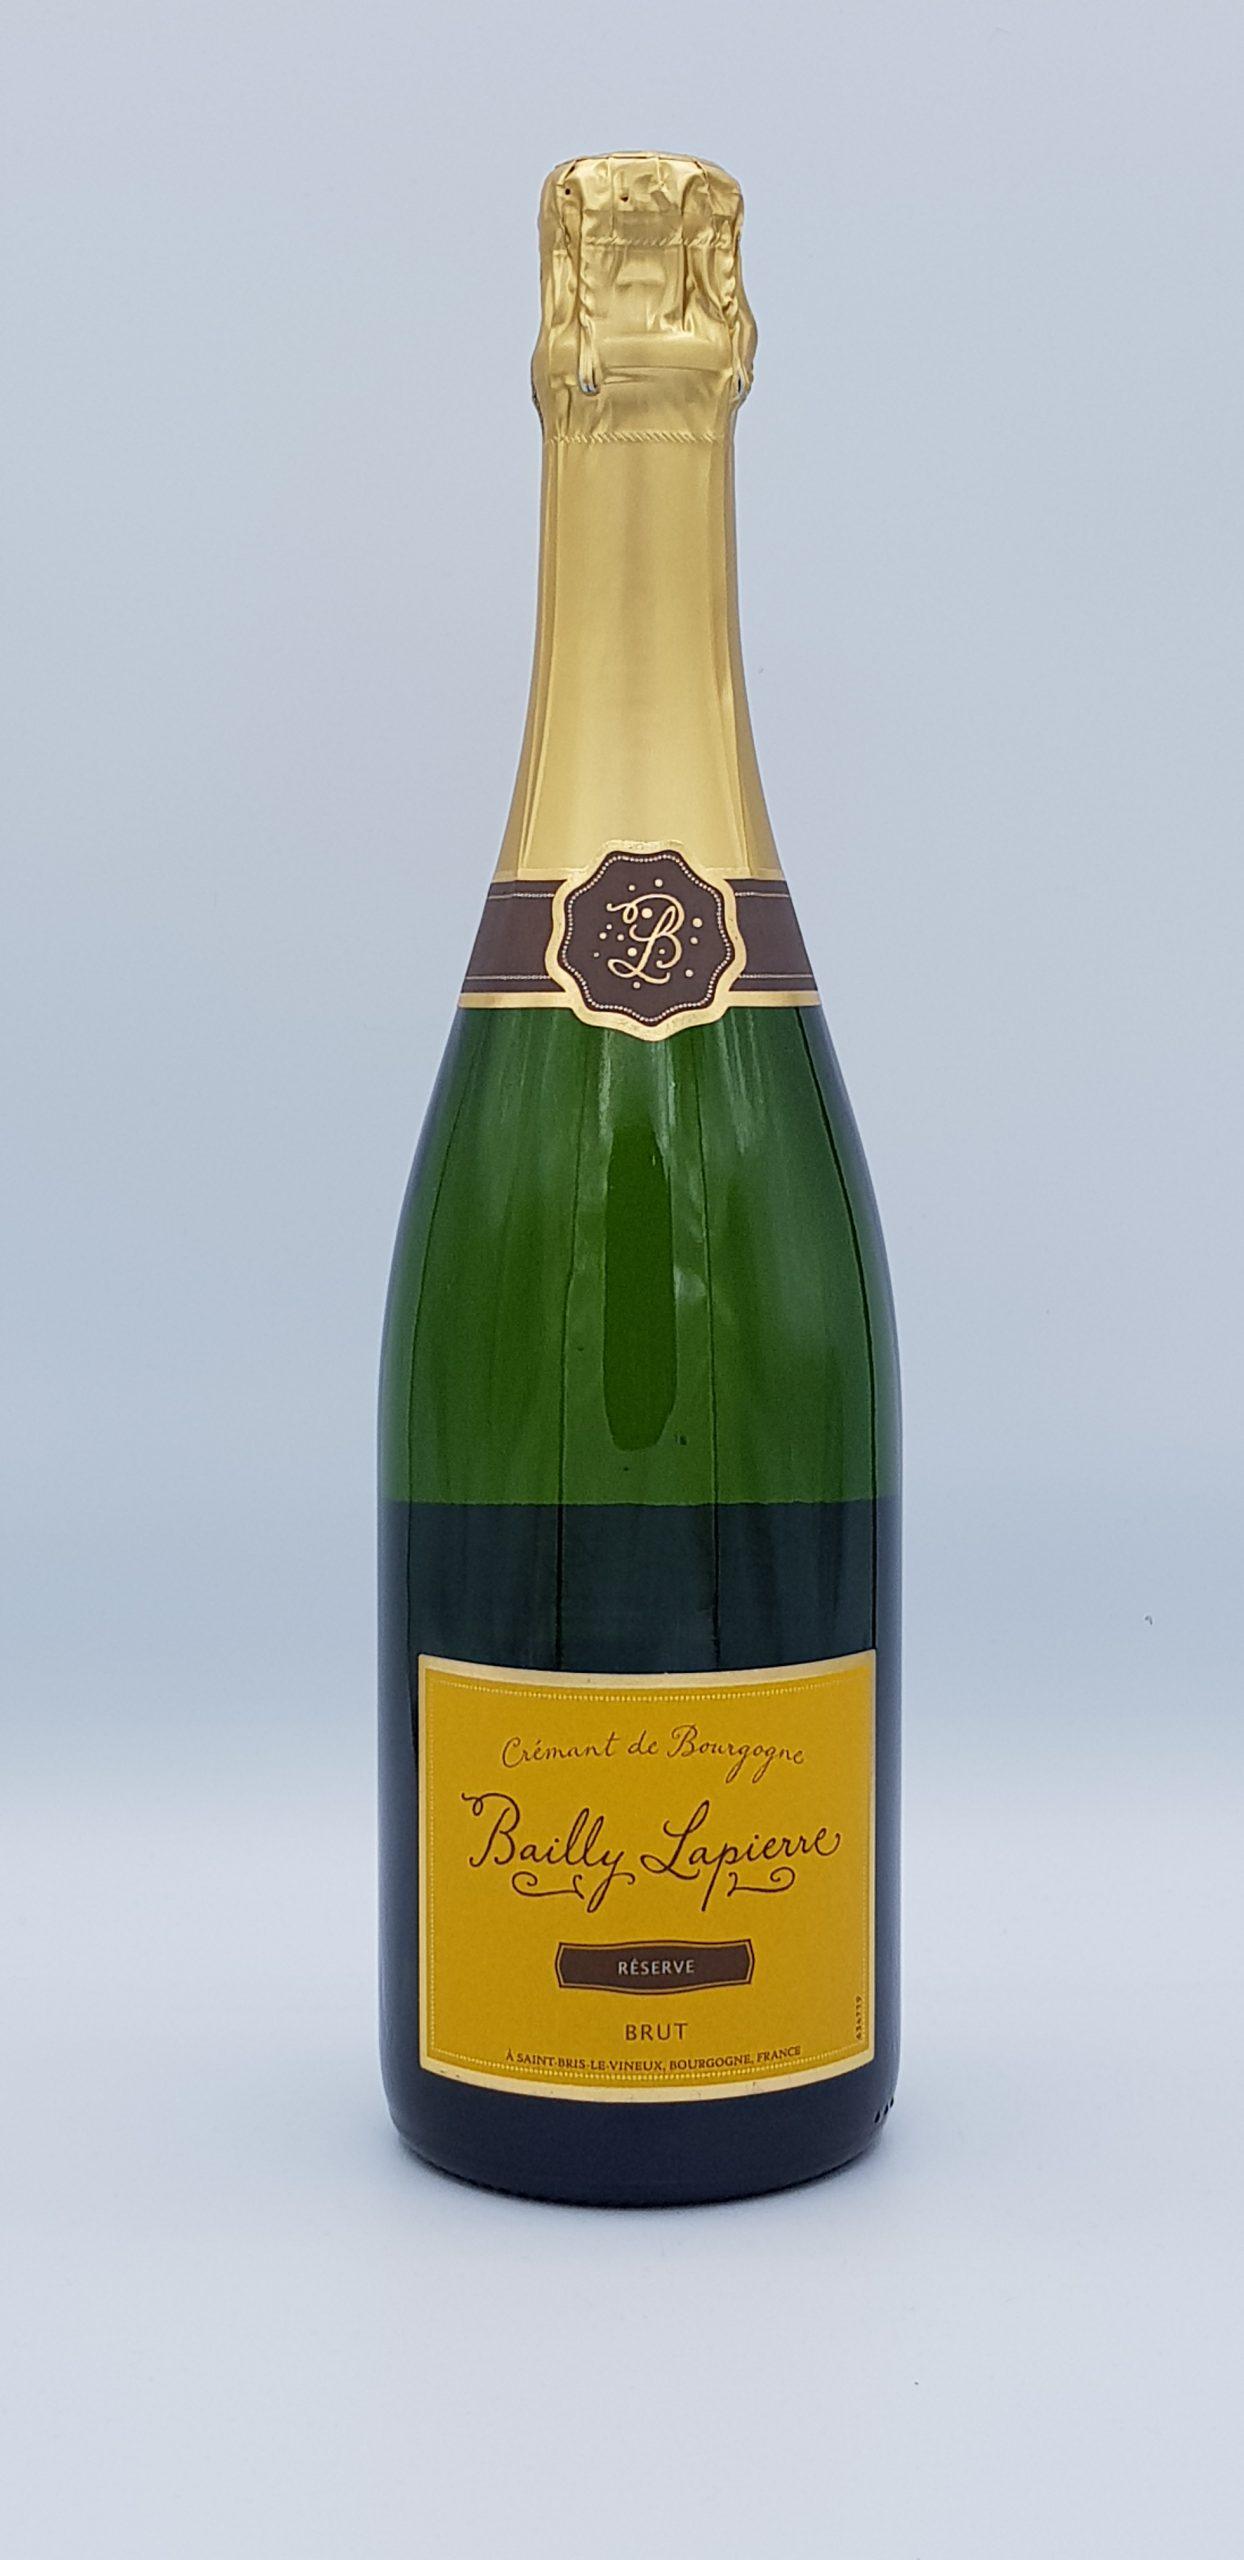 Cremant De Bourgogne Reserve Bailly Brut